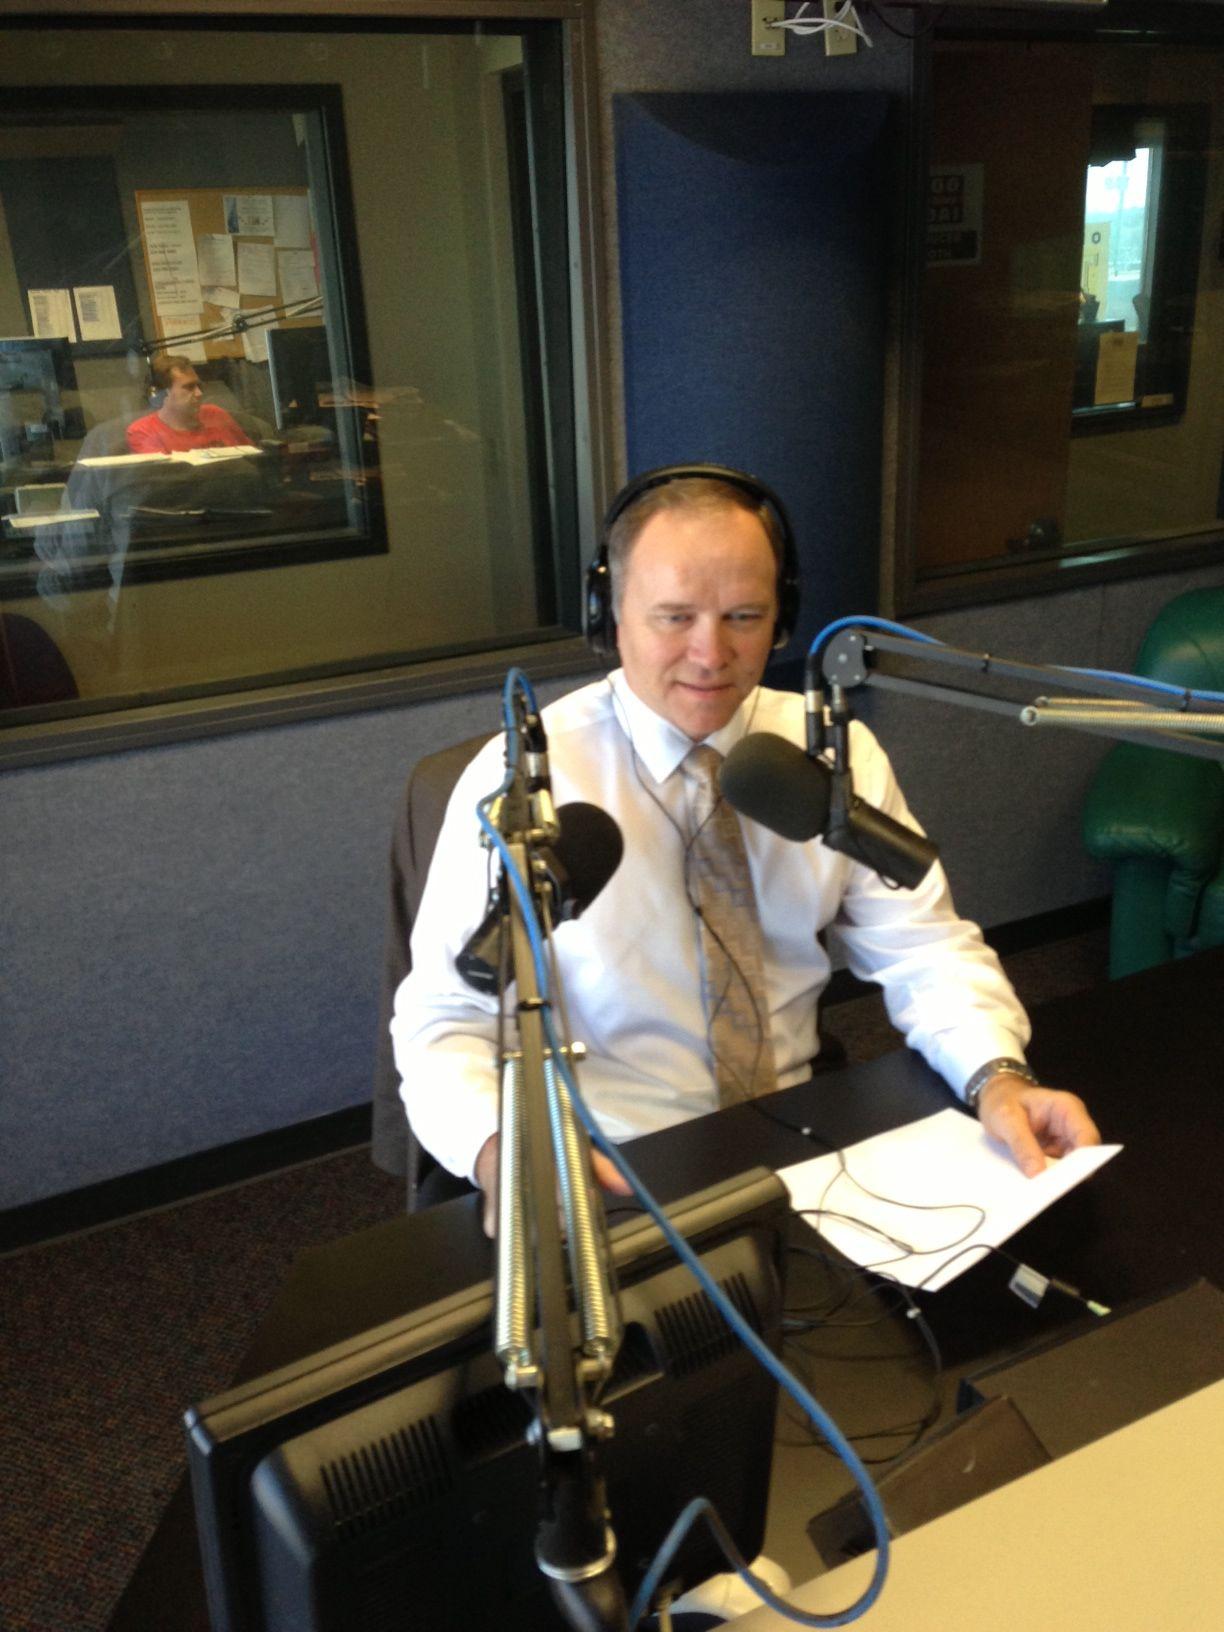 Keith on the Radio